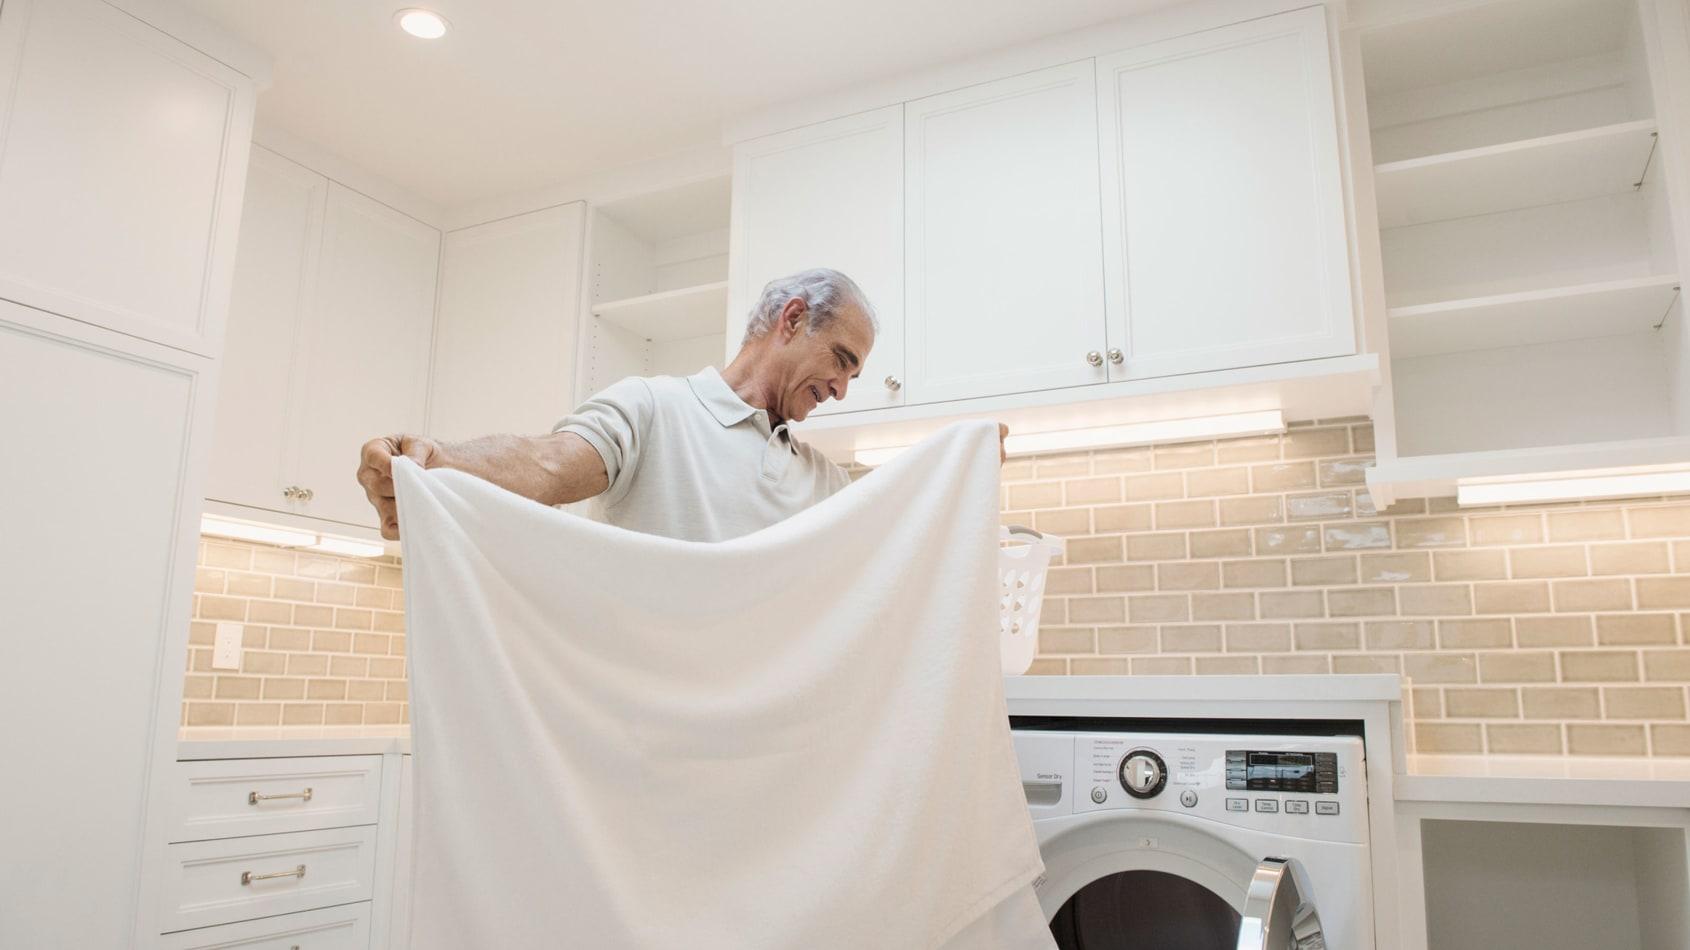 A senior man folding laundry in a laundry room.